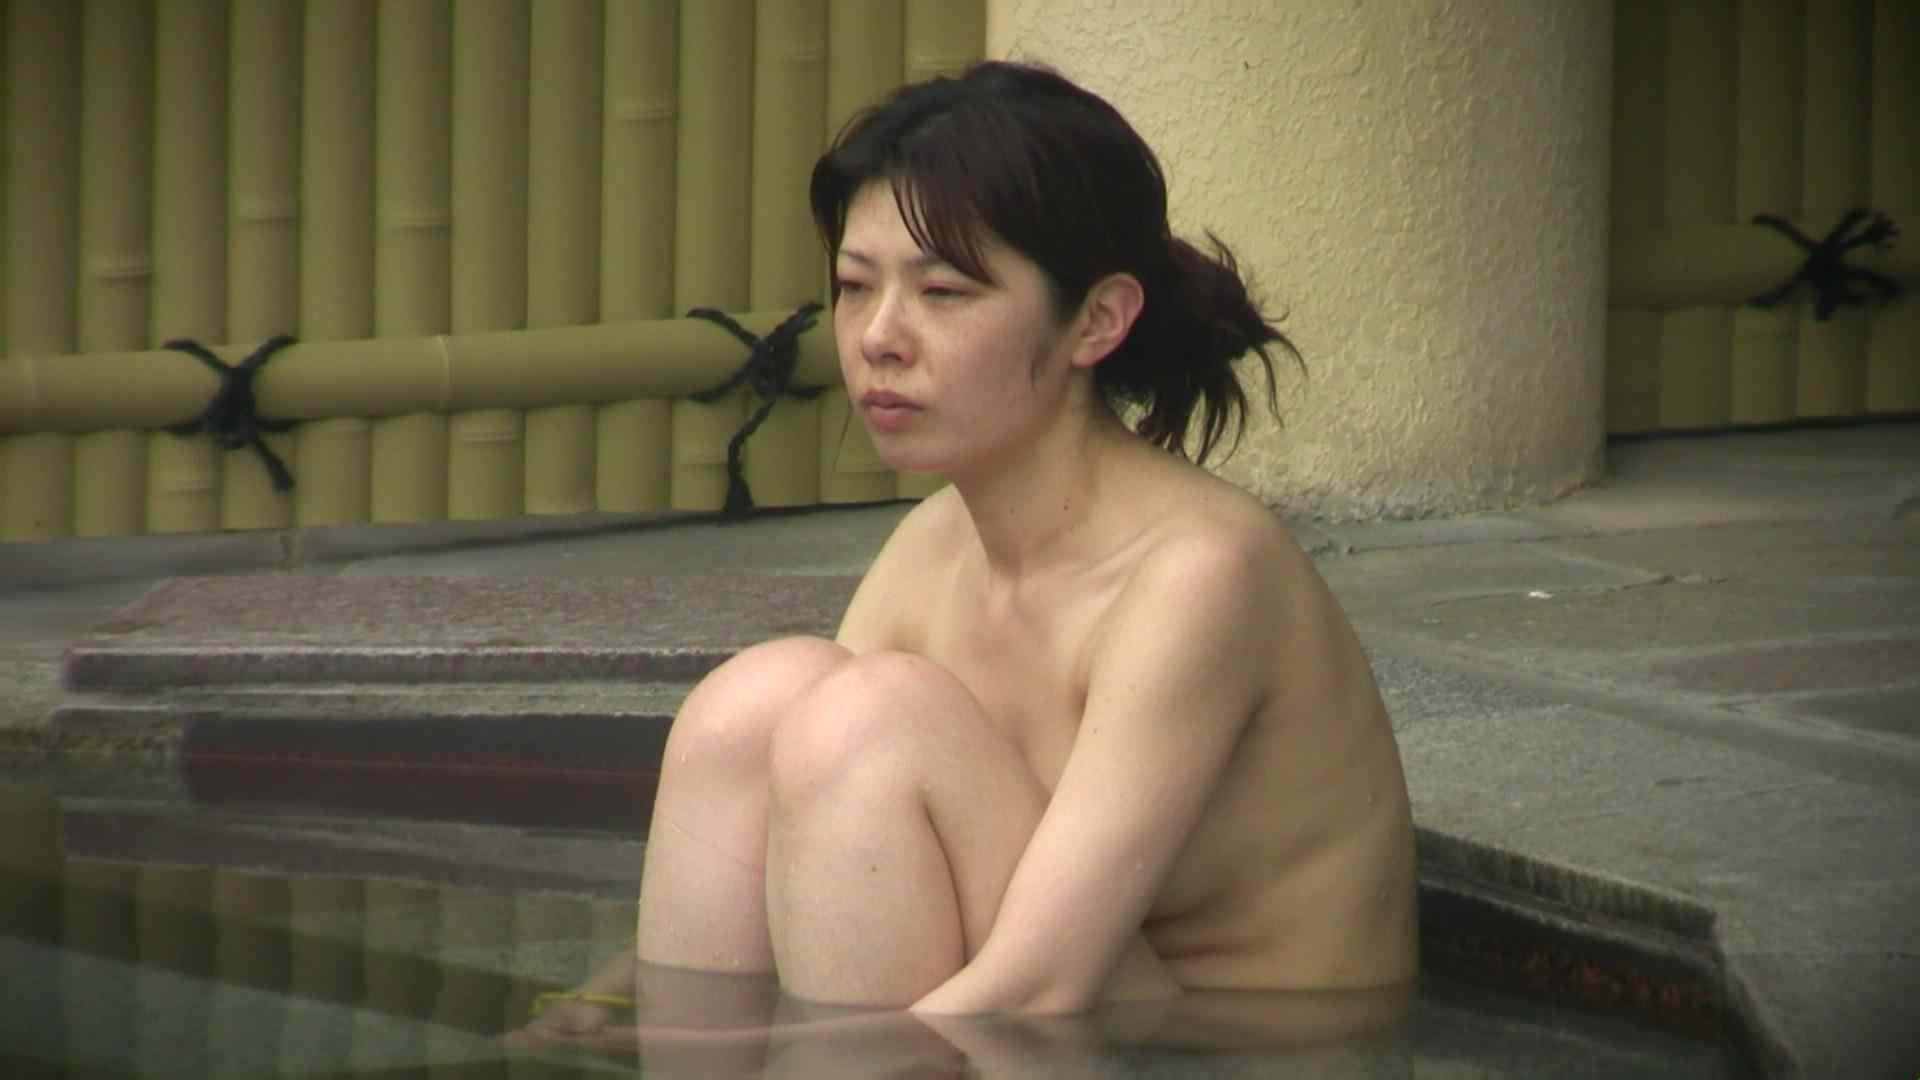 Aquaな露天風呂Vol.676 盗撮シリーズ | 露天風呂編  83PIX 63